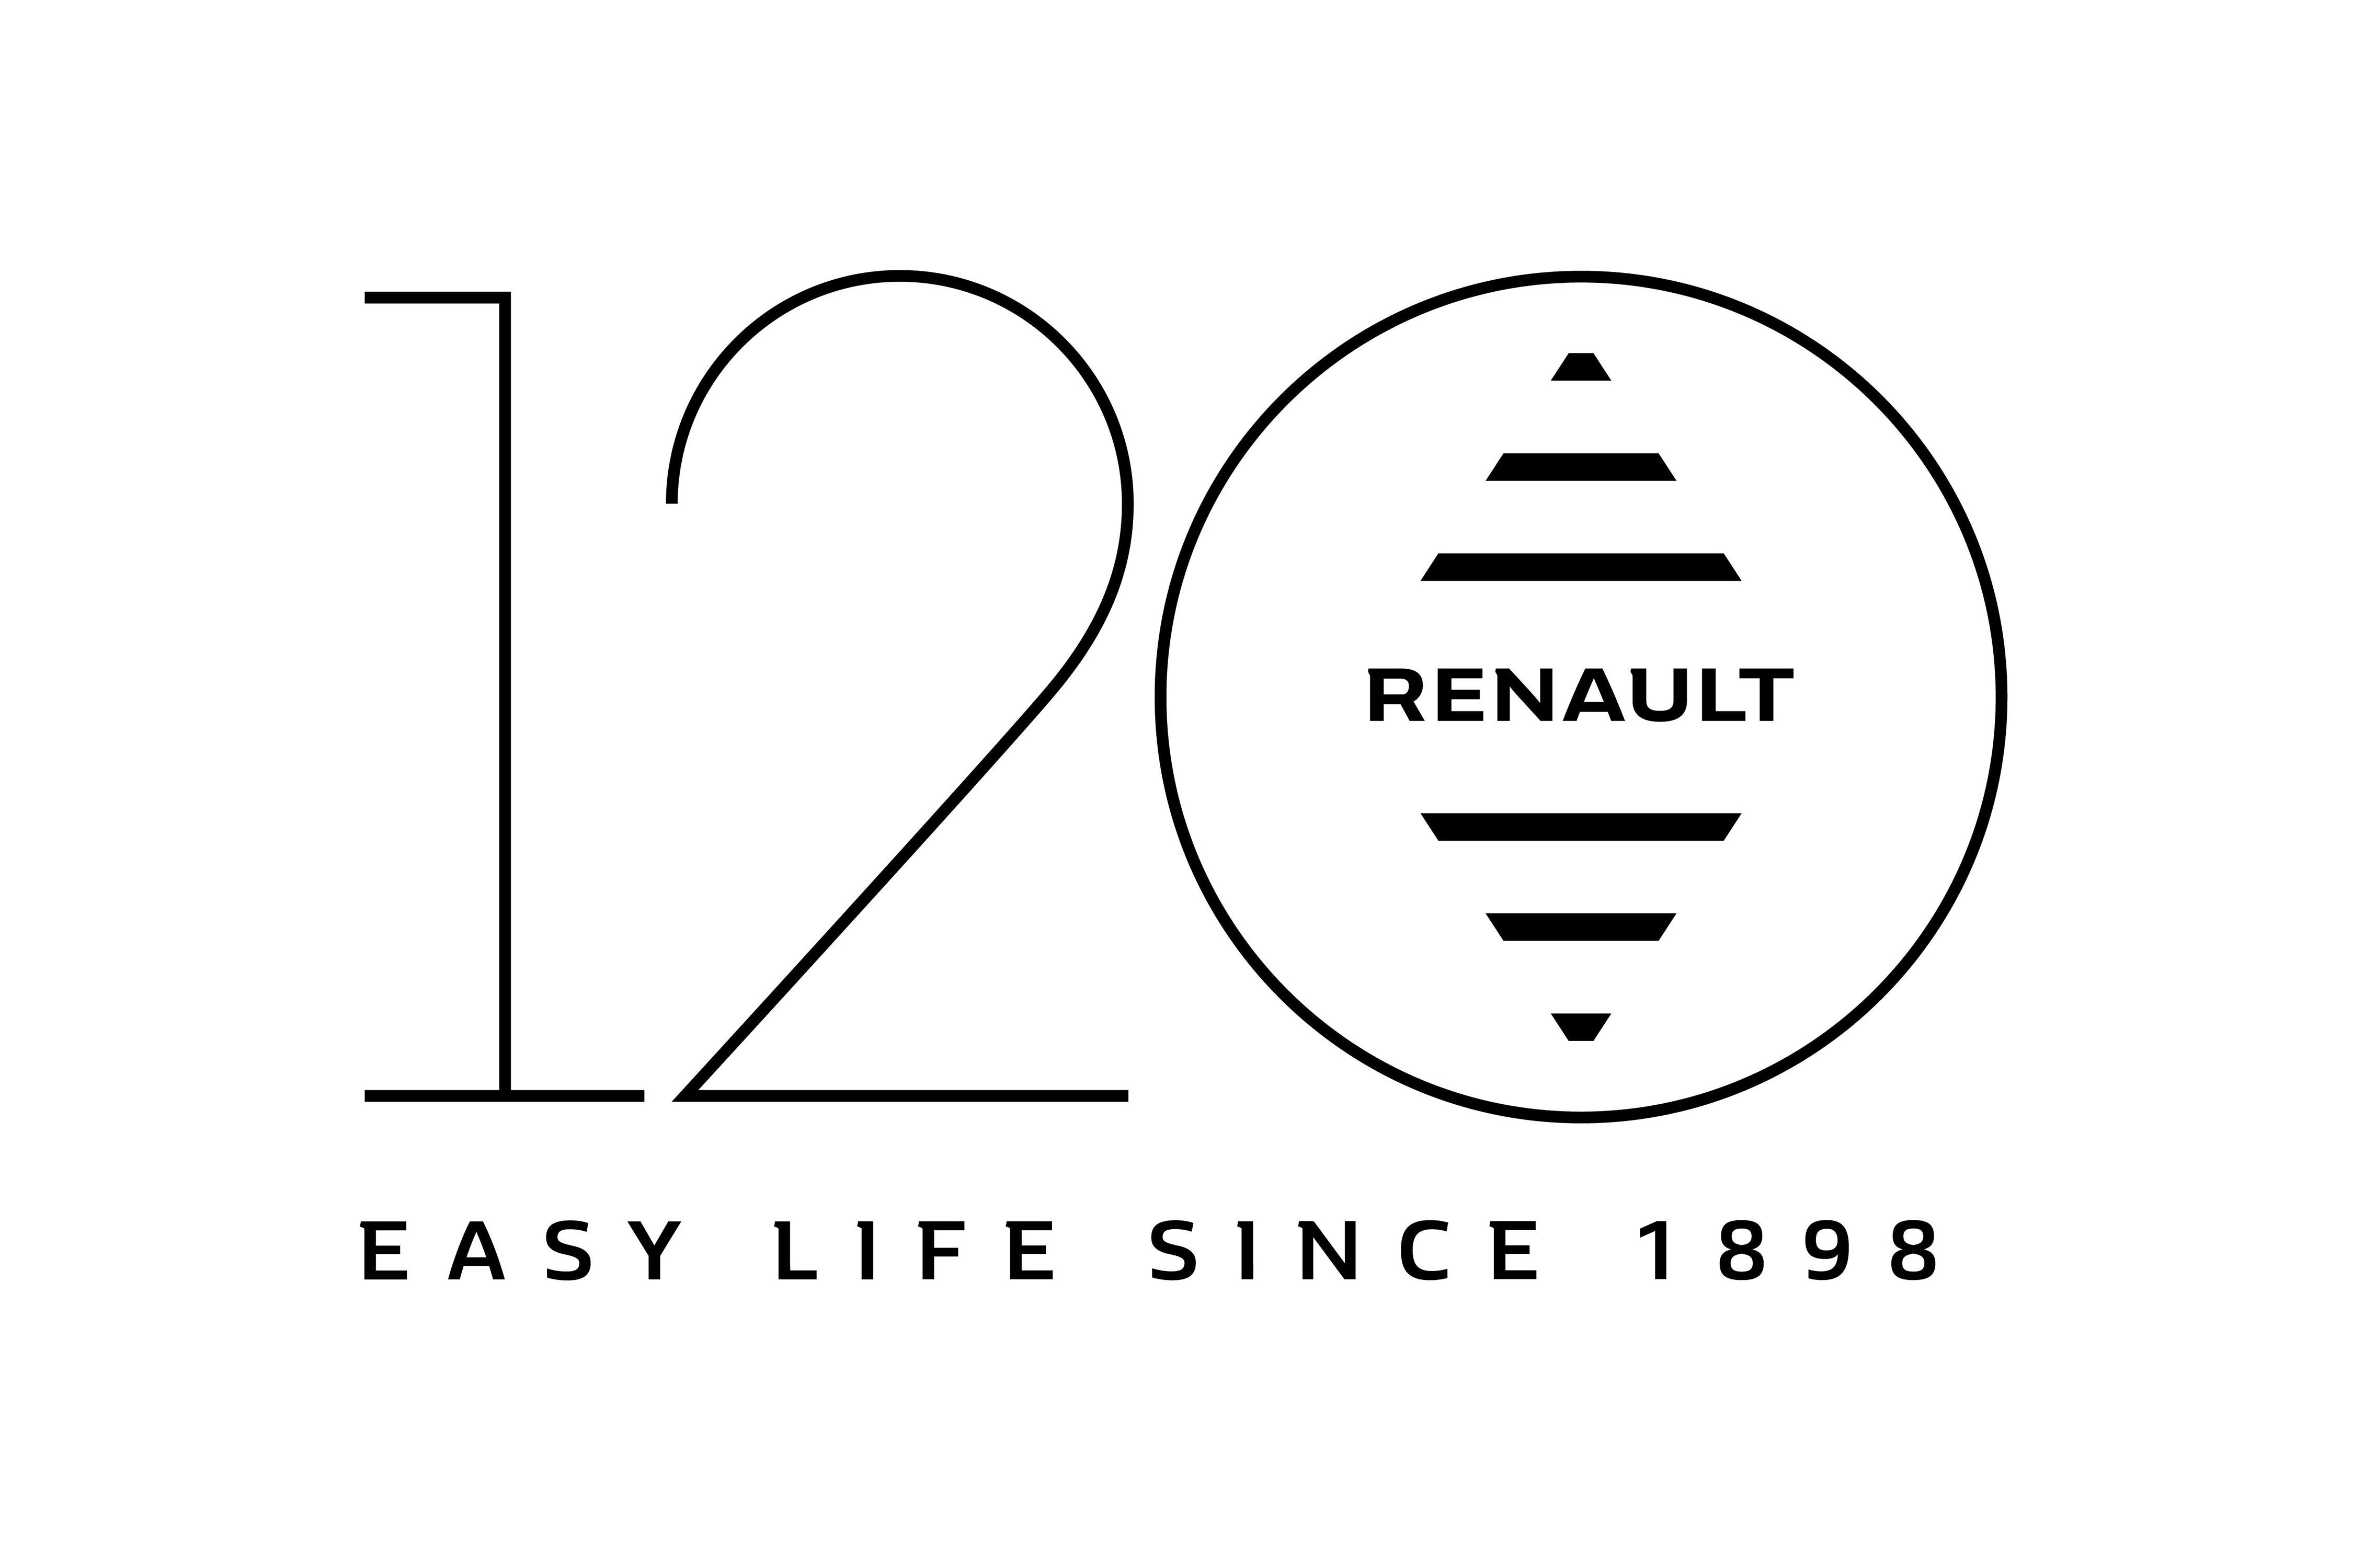 r u00e9tromobile 2018  renault presenteert 120 jaar  u2018easy life u2019